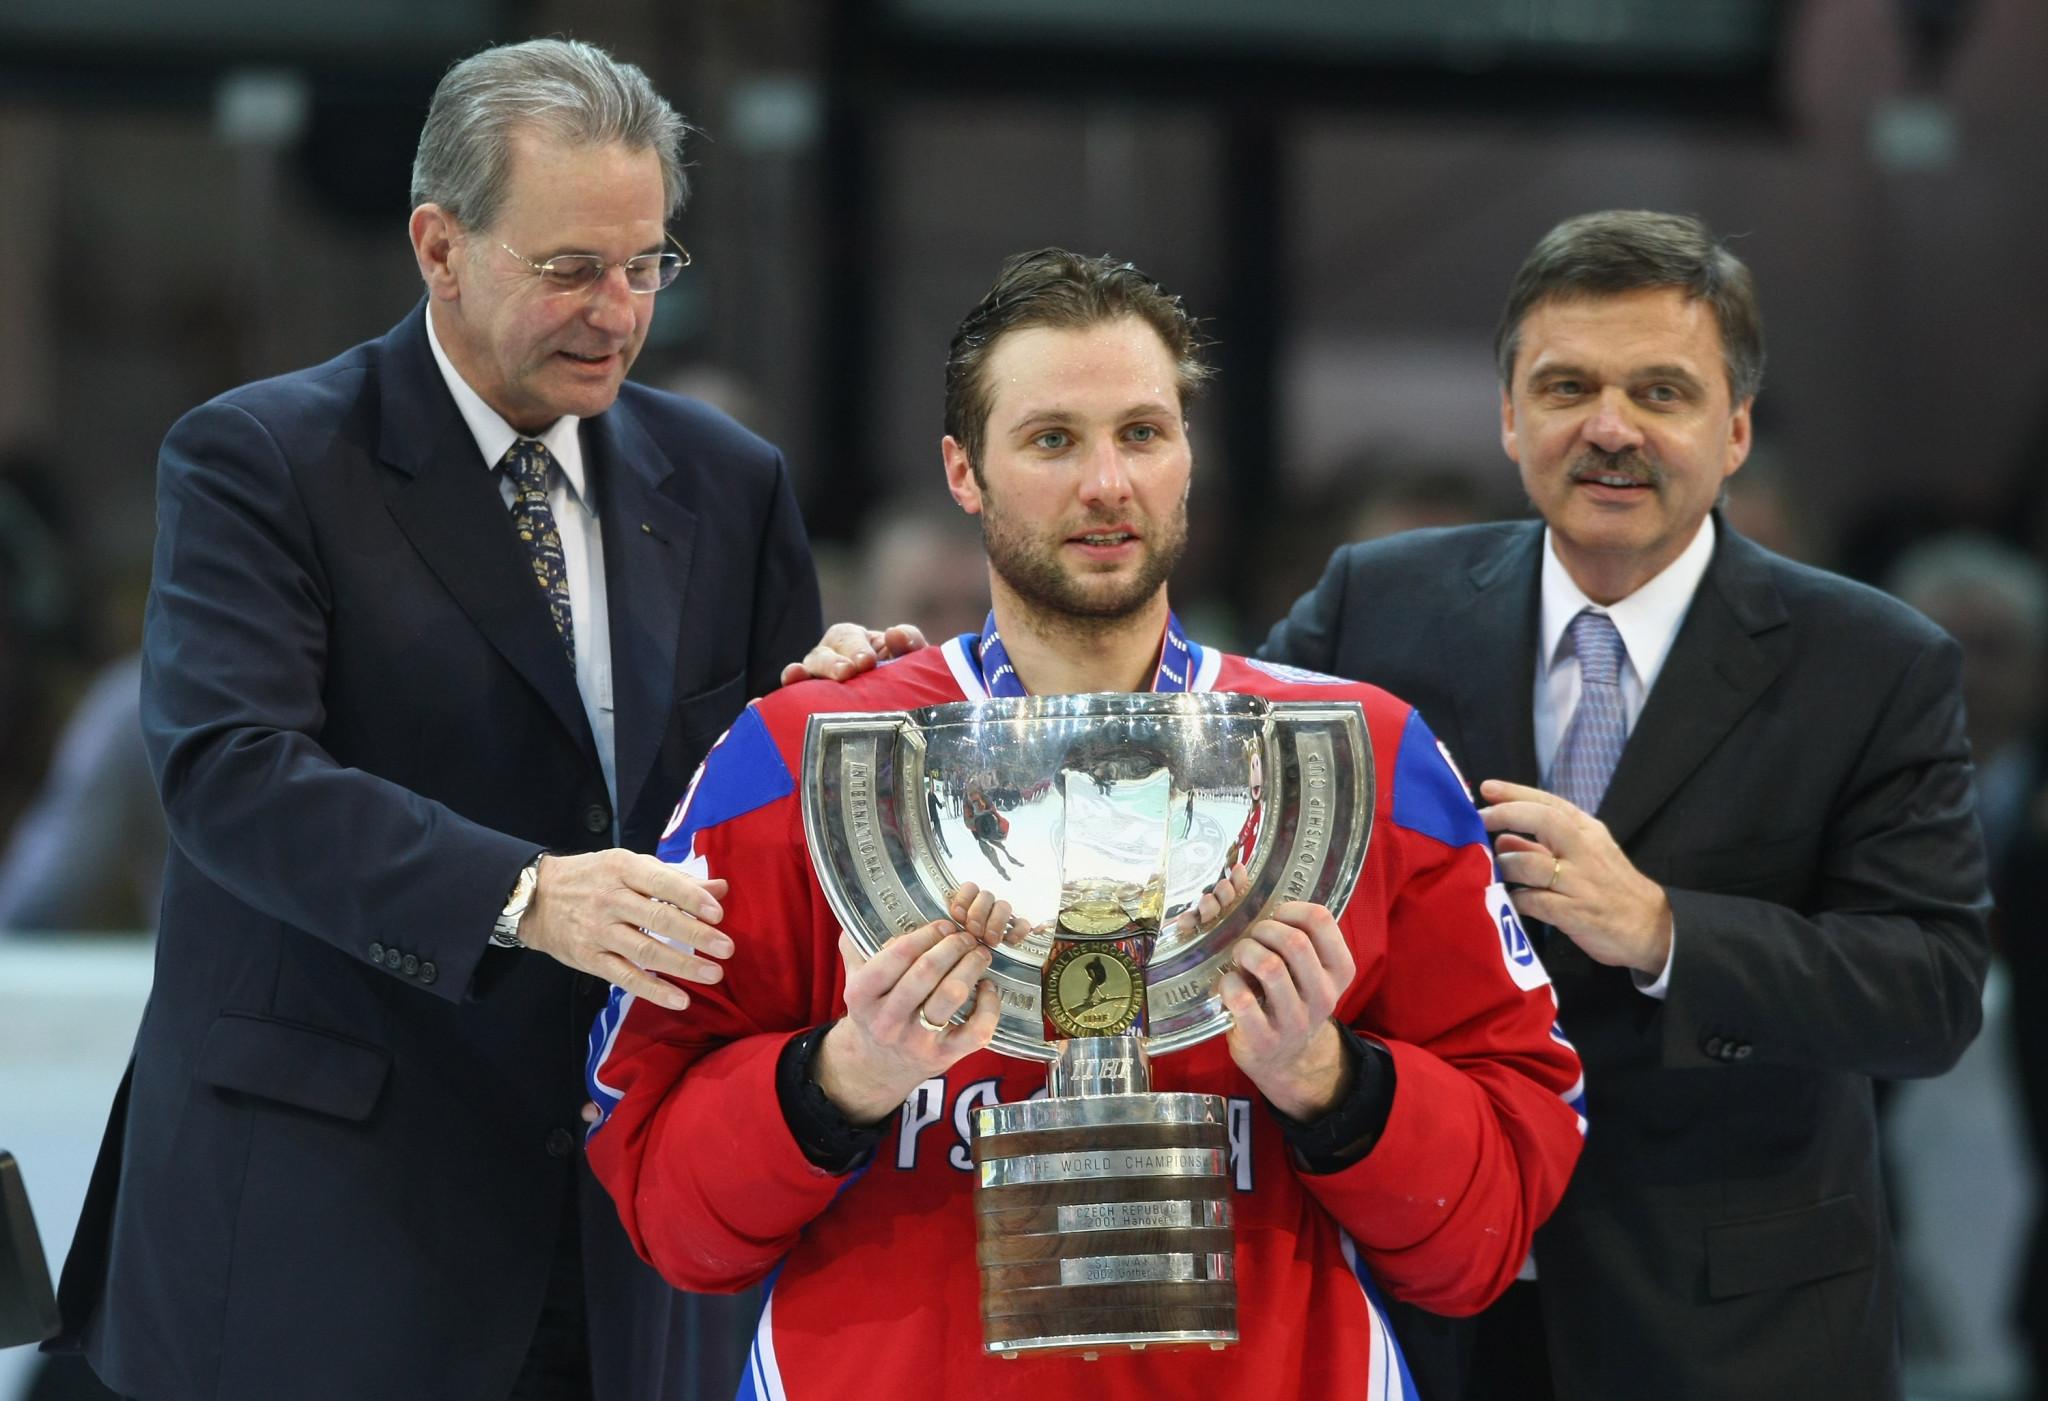 Olympic medallist replaces Chernyshenko as Kontinental Hockey League President